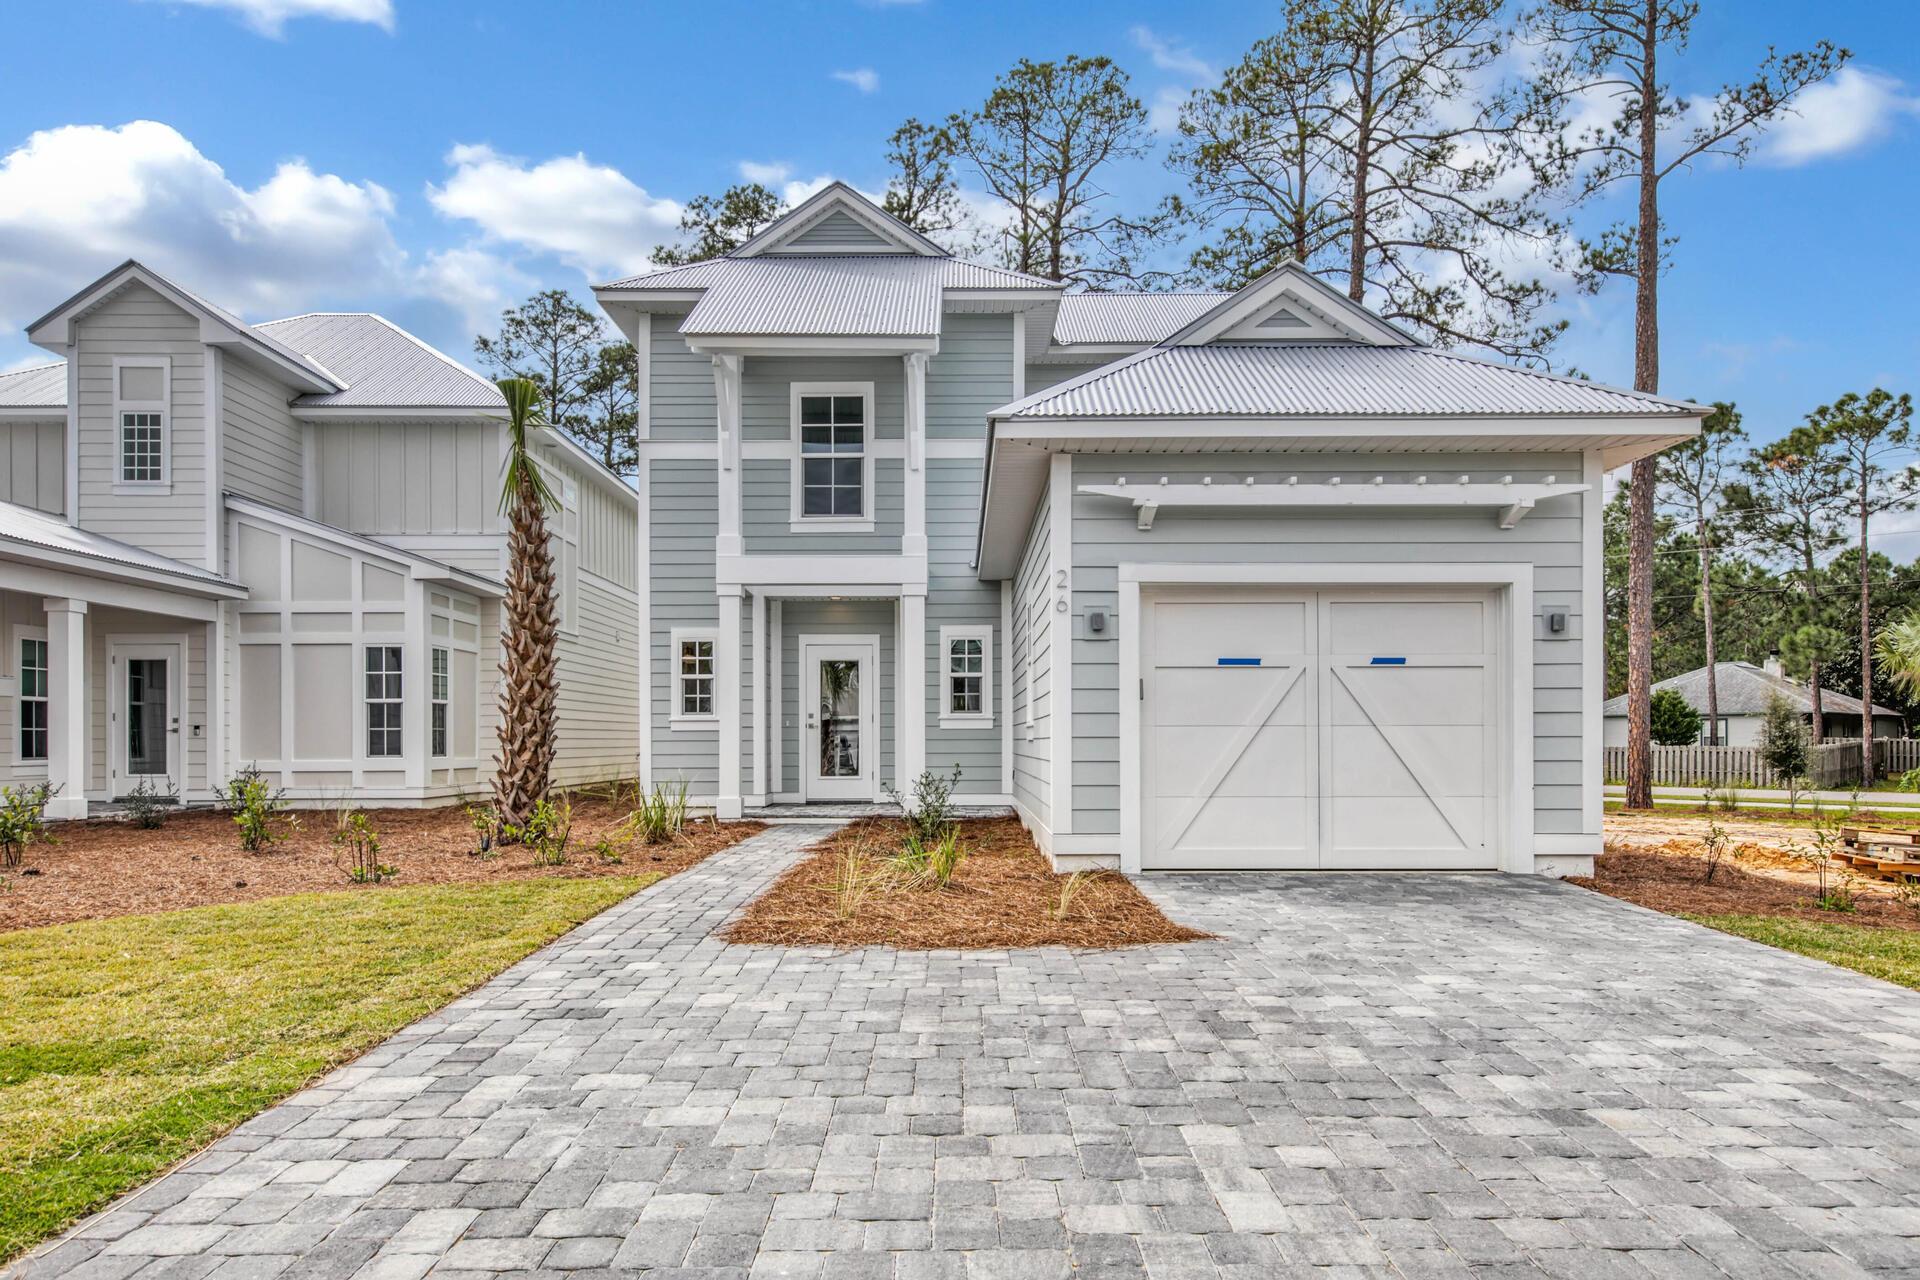 Photo of home for sale at 26 Sugar Sands Drive, Santa Rosa Beach FL